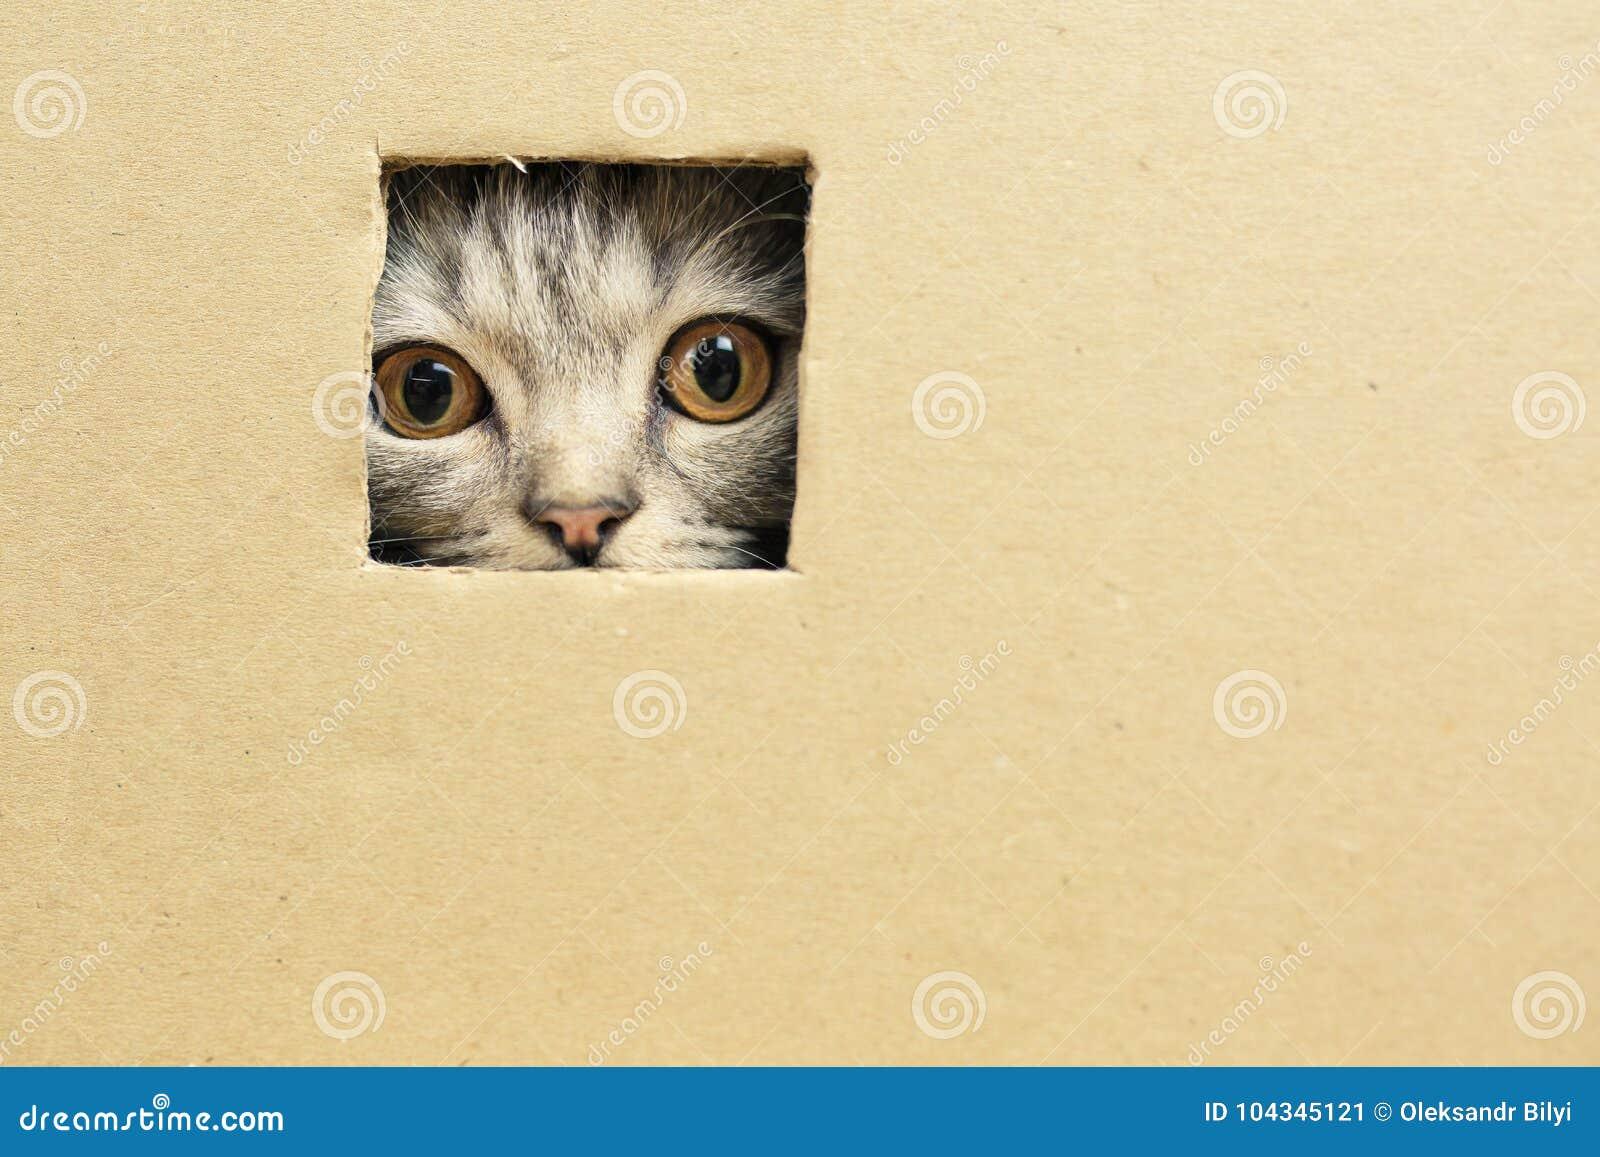 kitten sitting in a cardboard box, looks through a hole